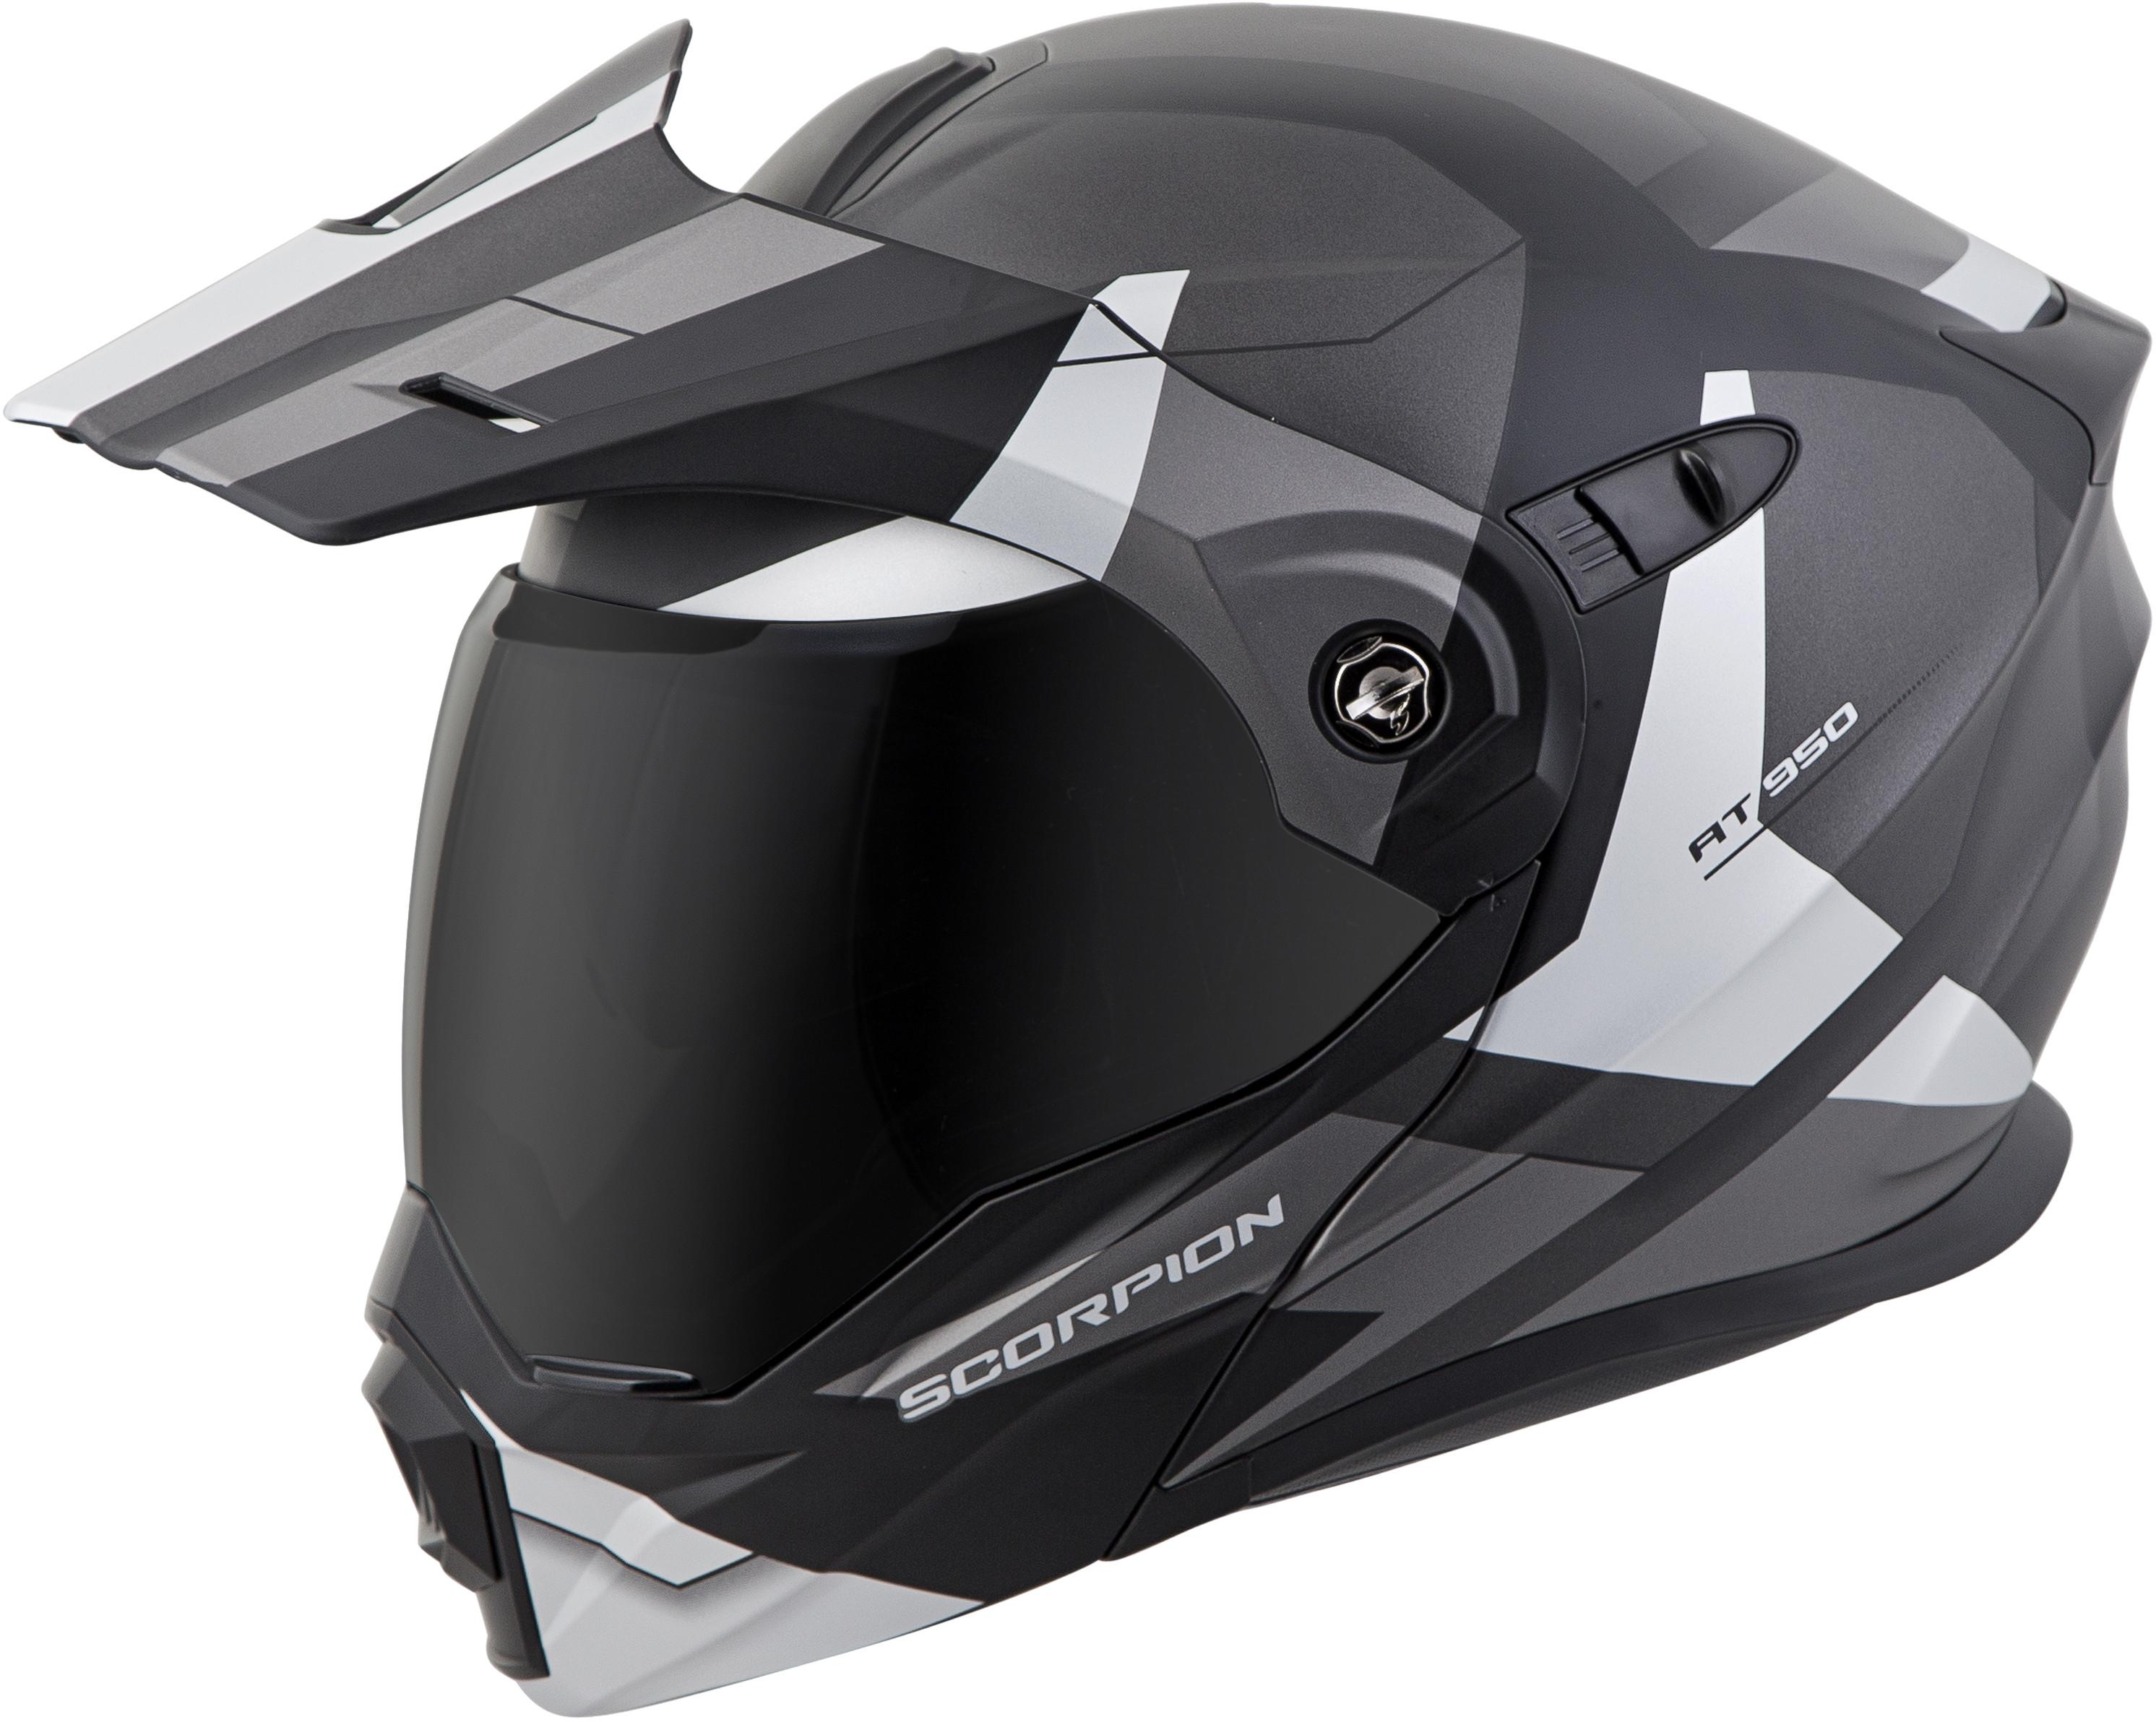 for-Scorpion-Helmet-EXO-AT950-Neocon-Snow-Helmet-with-Dual-Lens-Shield miniature 32